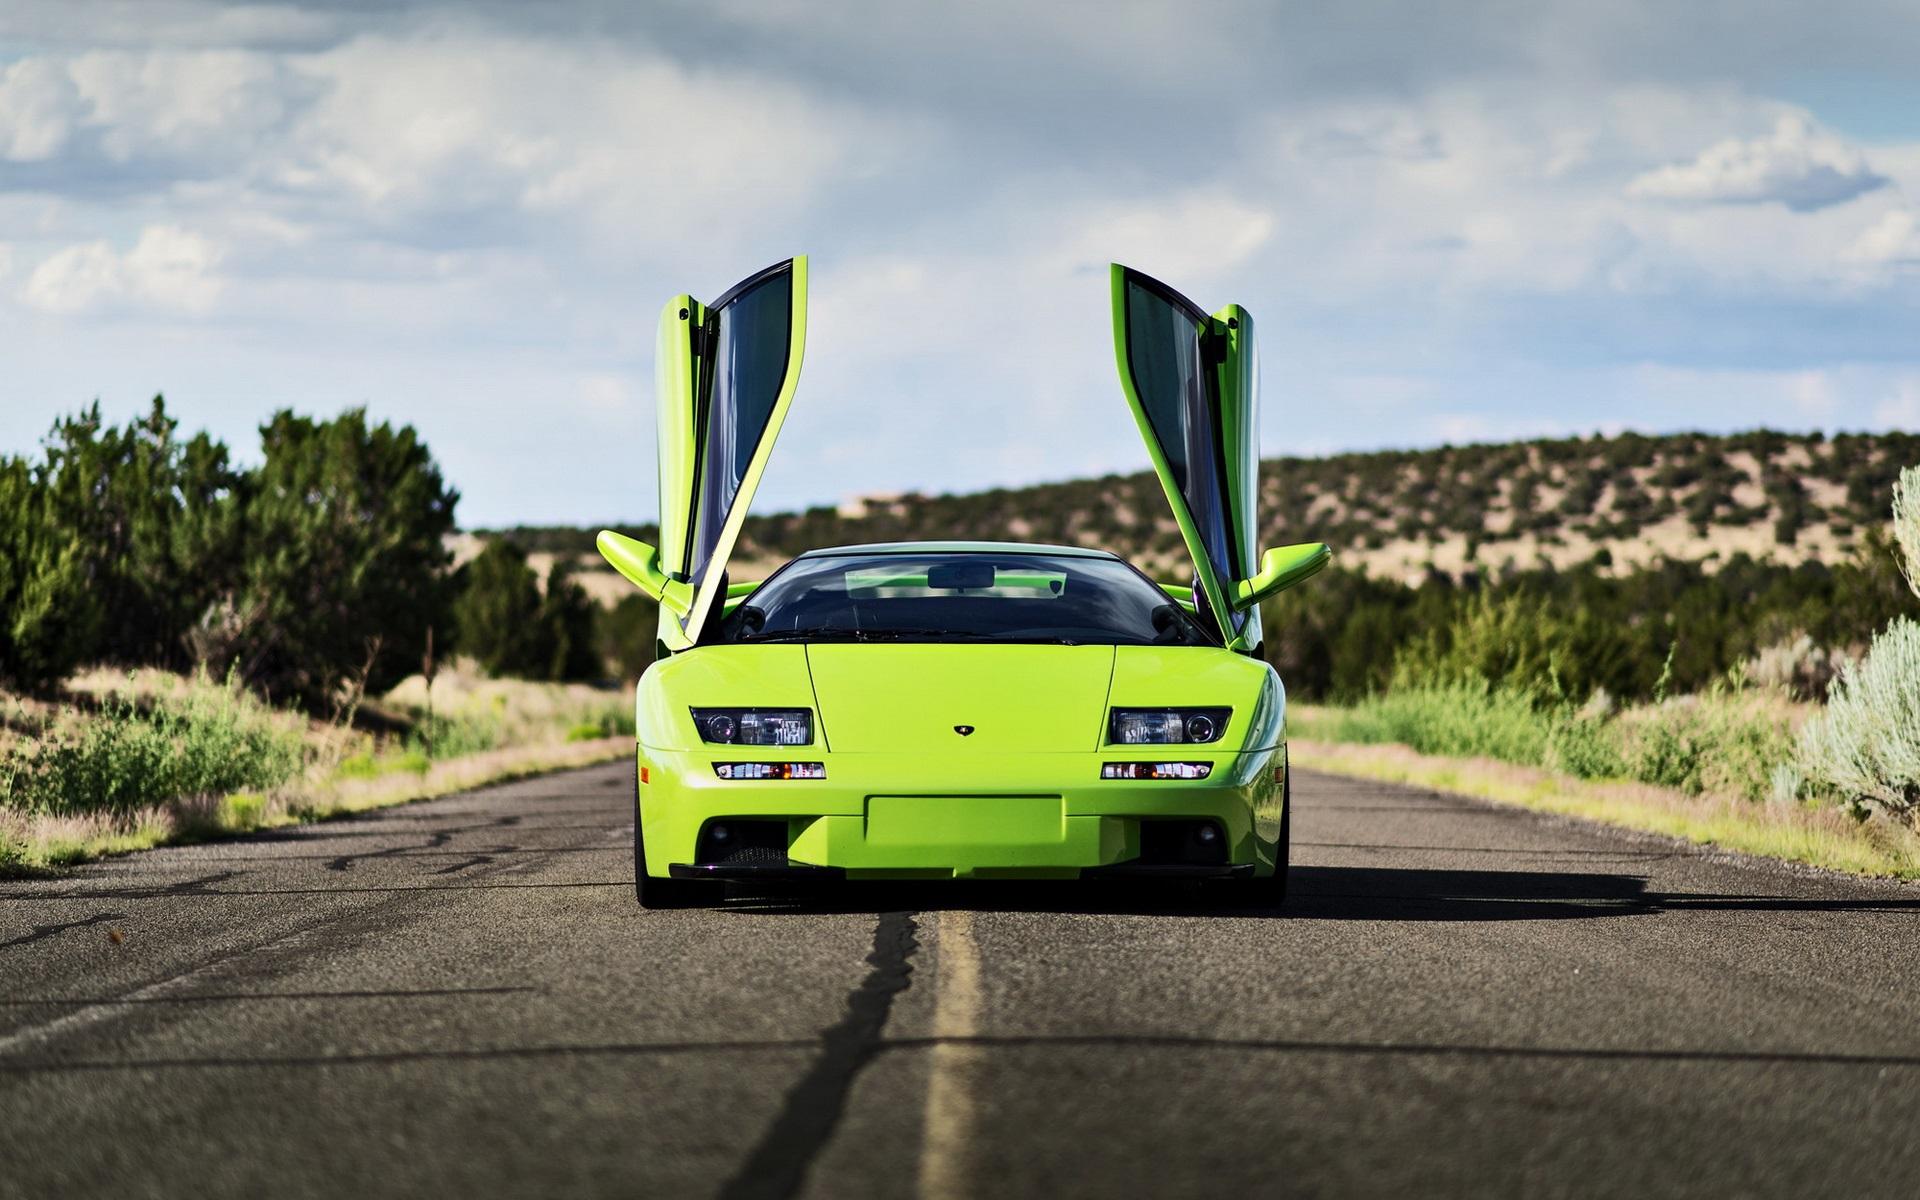 Wallpaper Green Lamborghini Supercar Doors Open 1920x1200 Hd